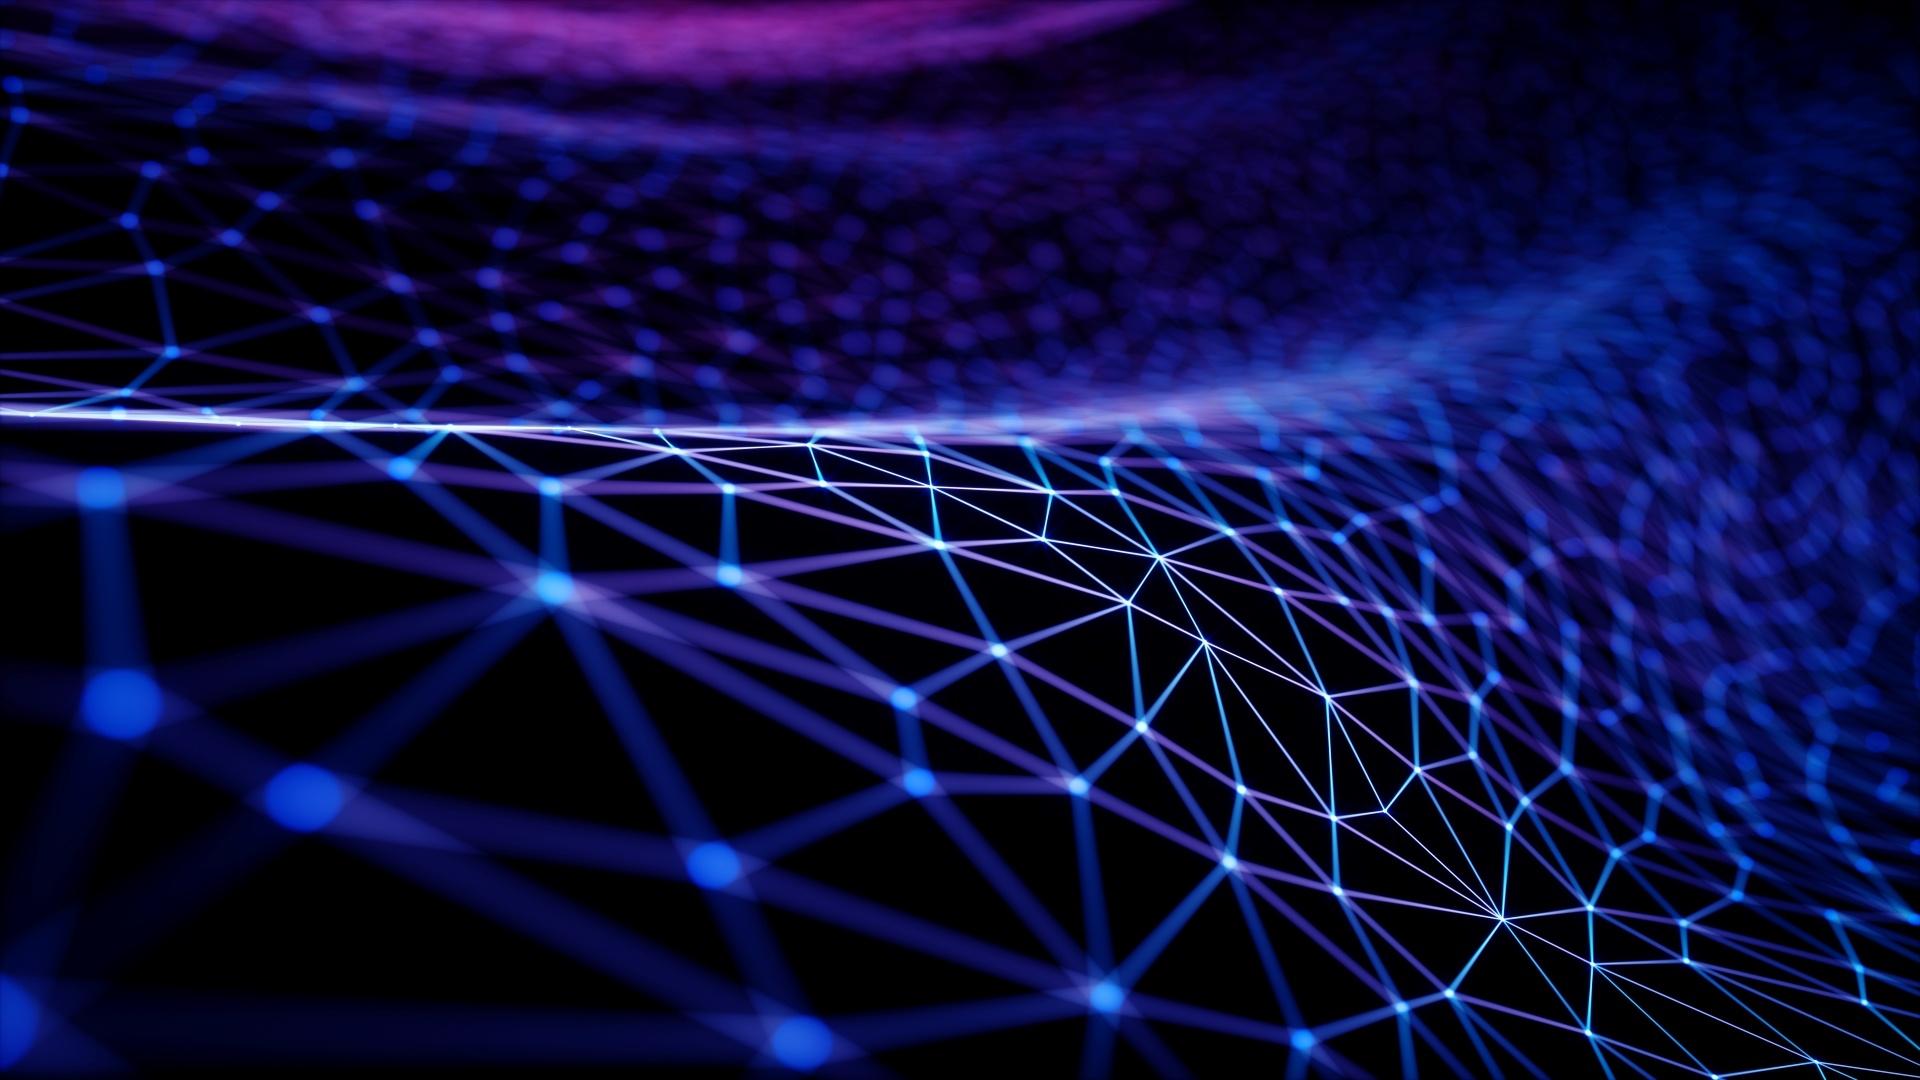 Connectivity fabric